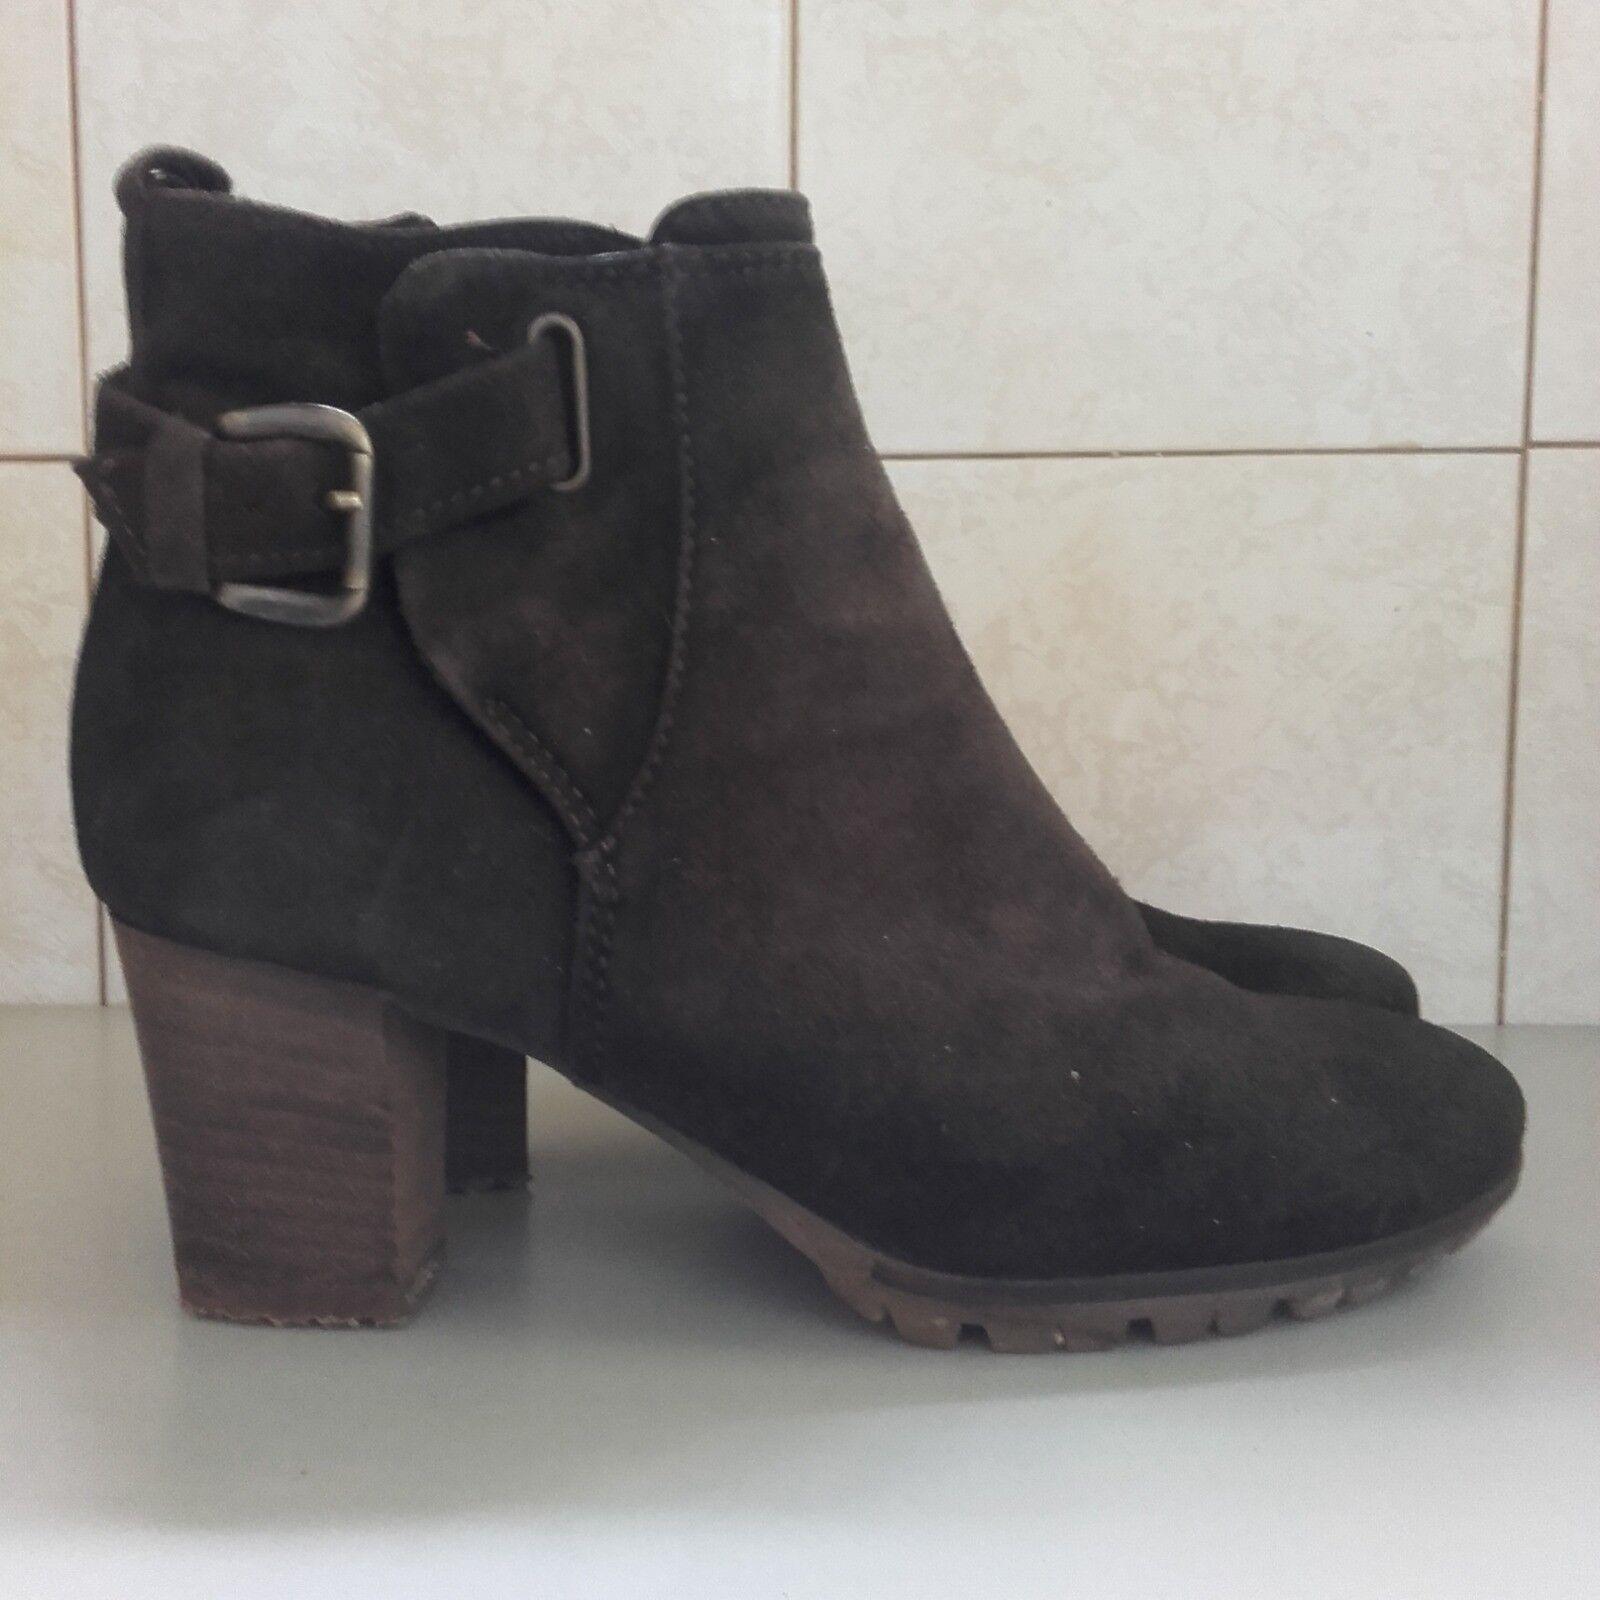 Stivaletti donna stivali MANAS pelle scamosciata marrone stivali donna stivale tronchetti 907c36